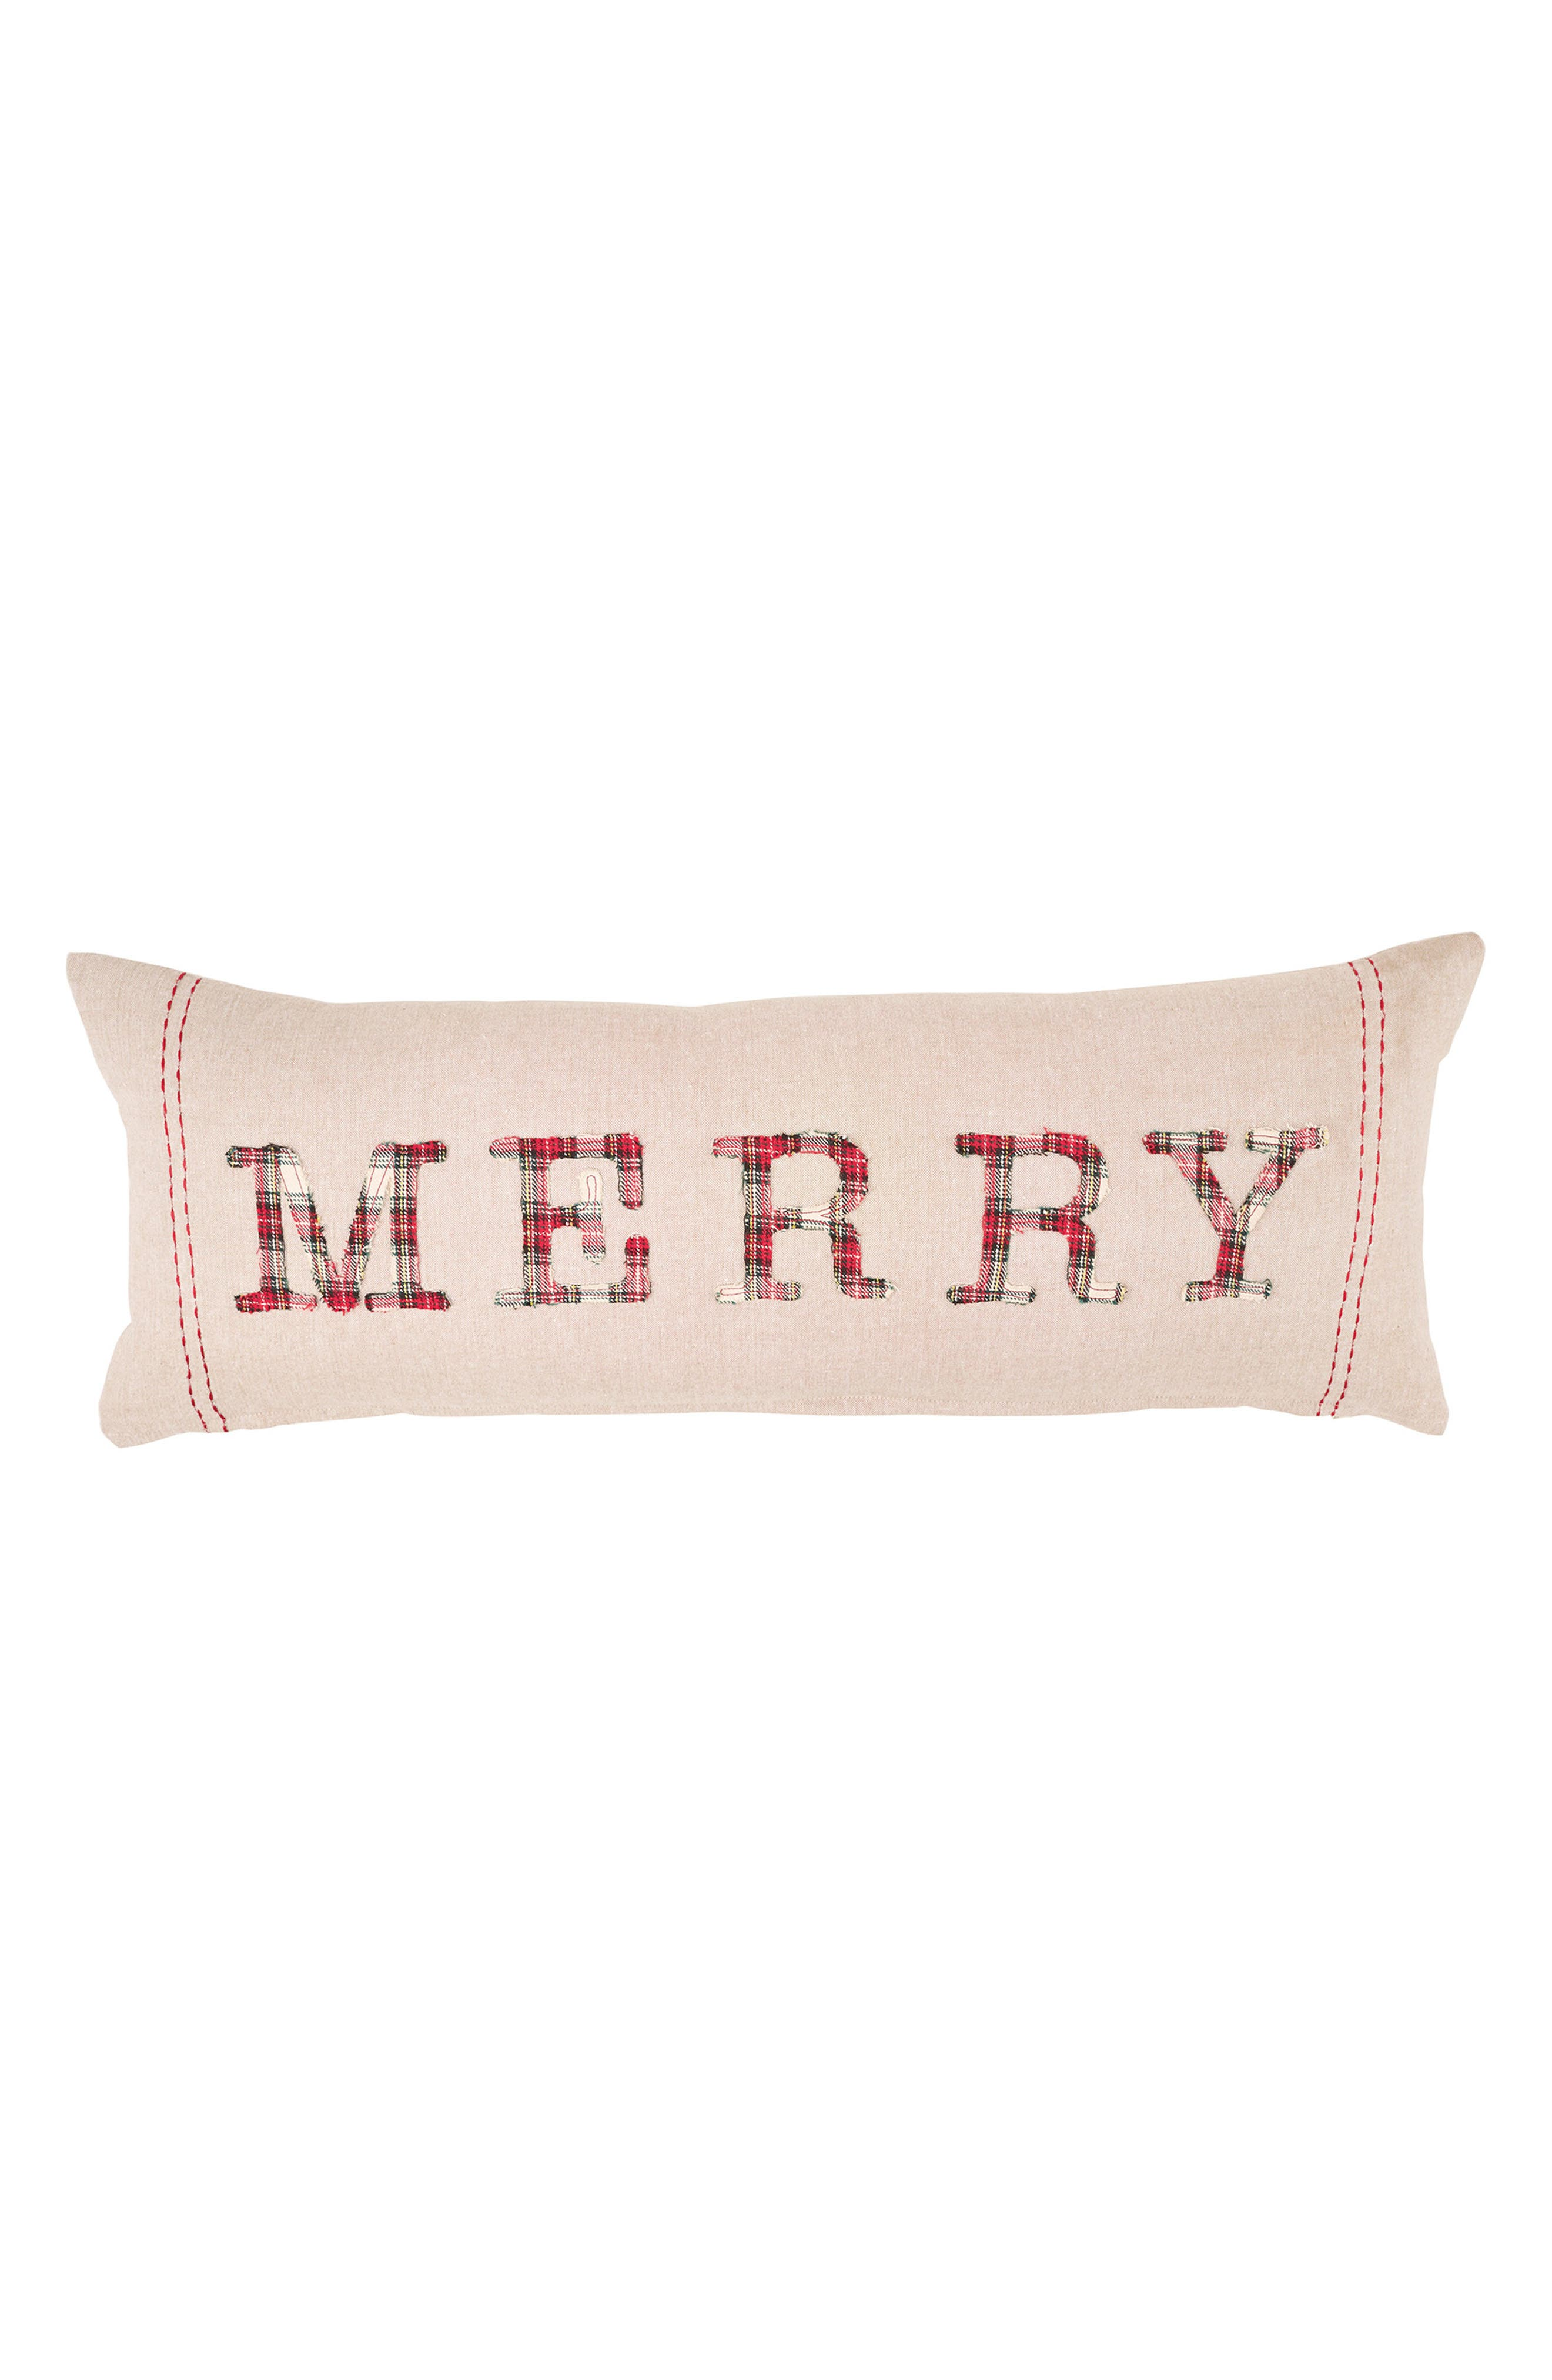 Mud Pie Merry Tartan Appliqué Accent Pillow